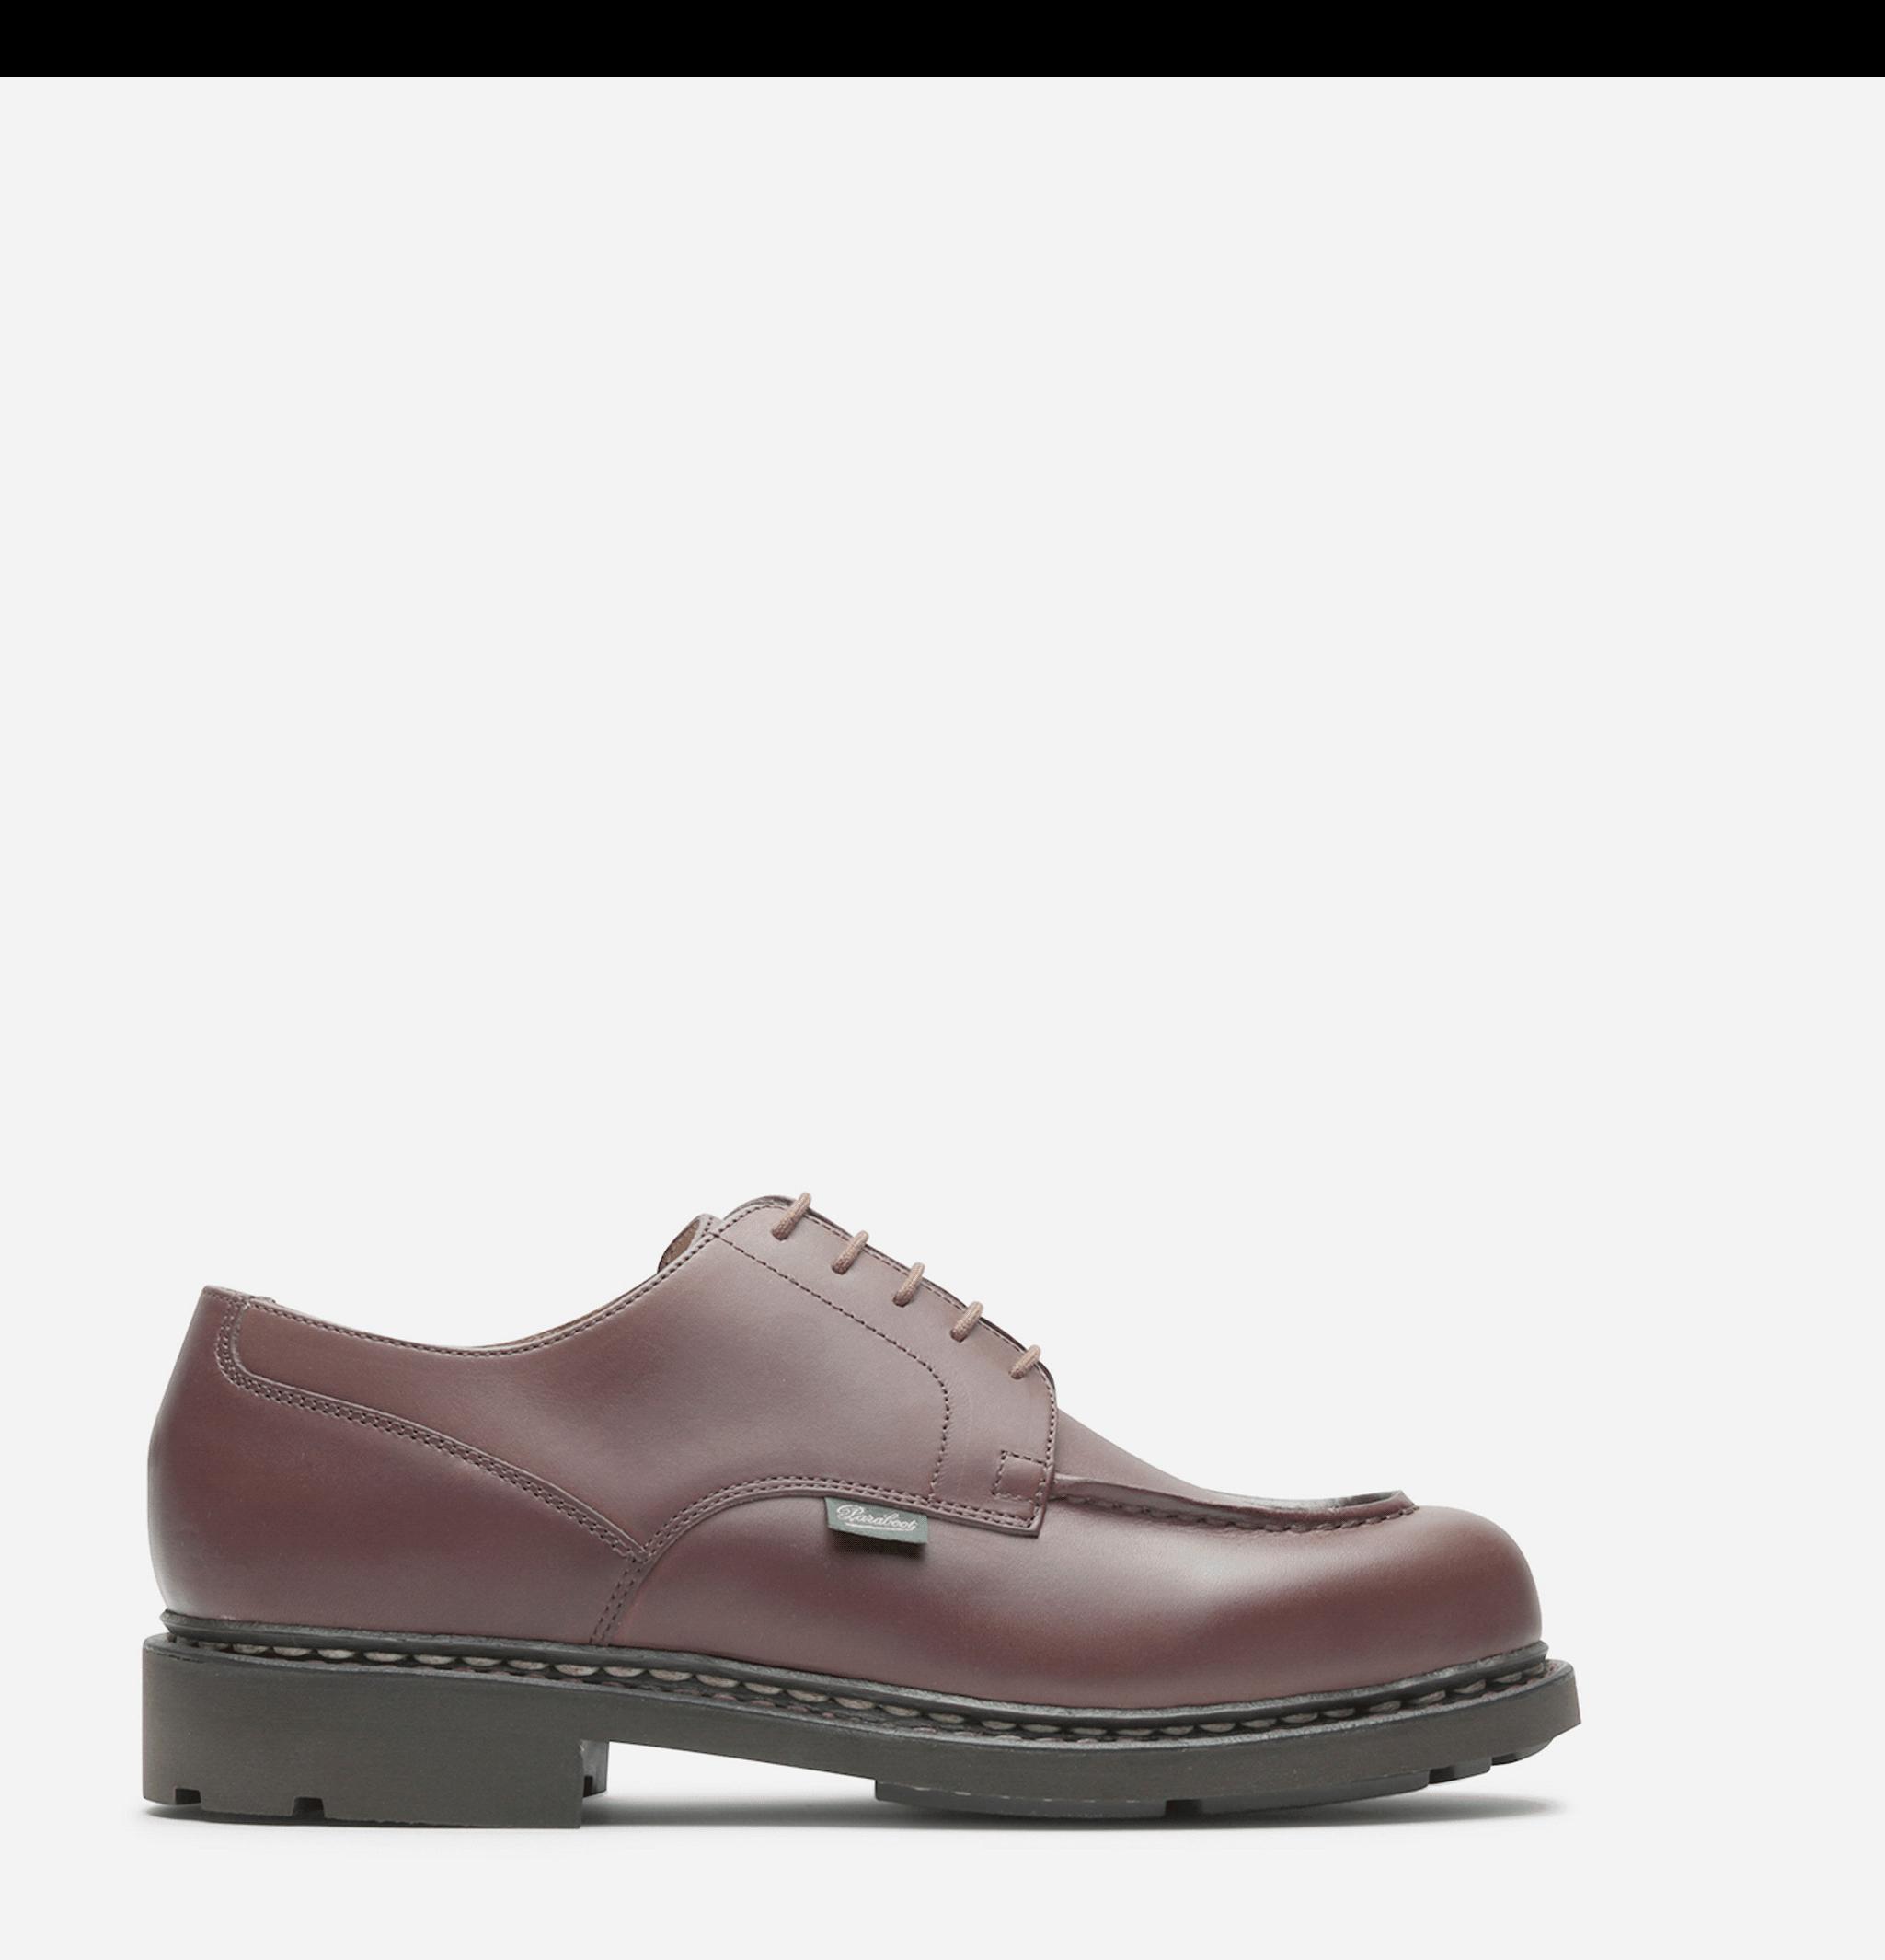 Chaussures Chambord Marron